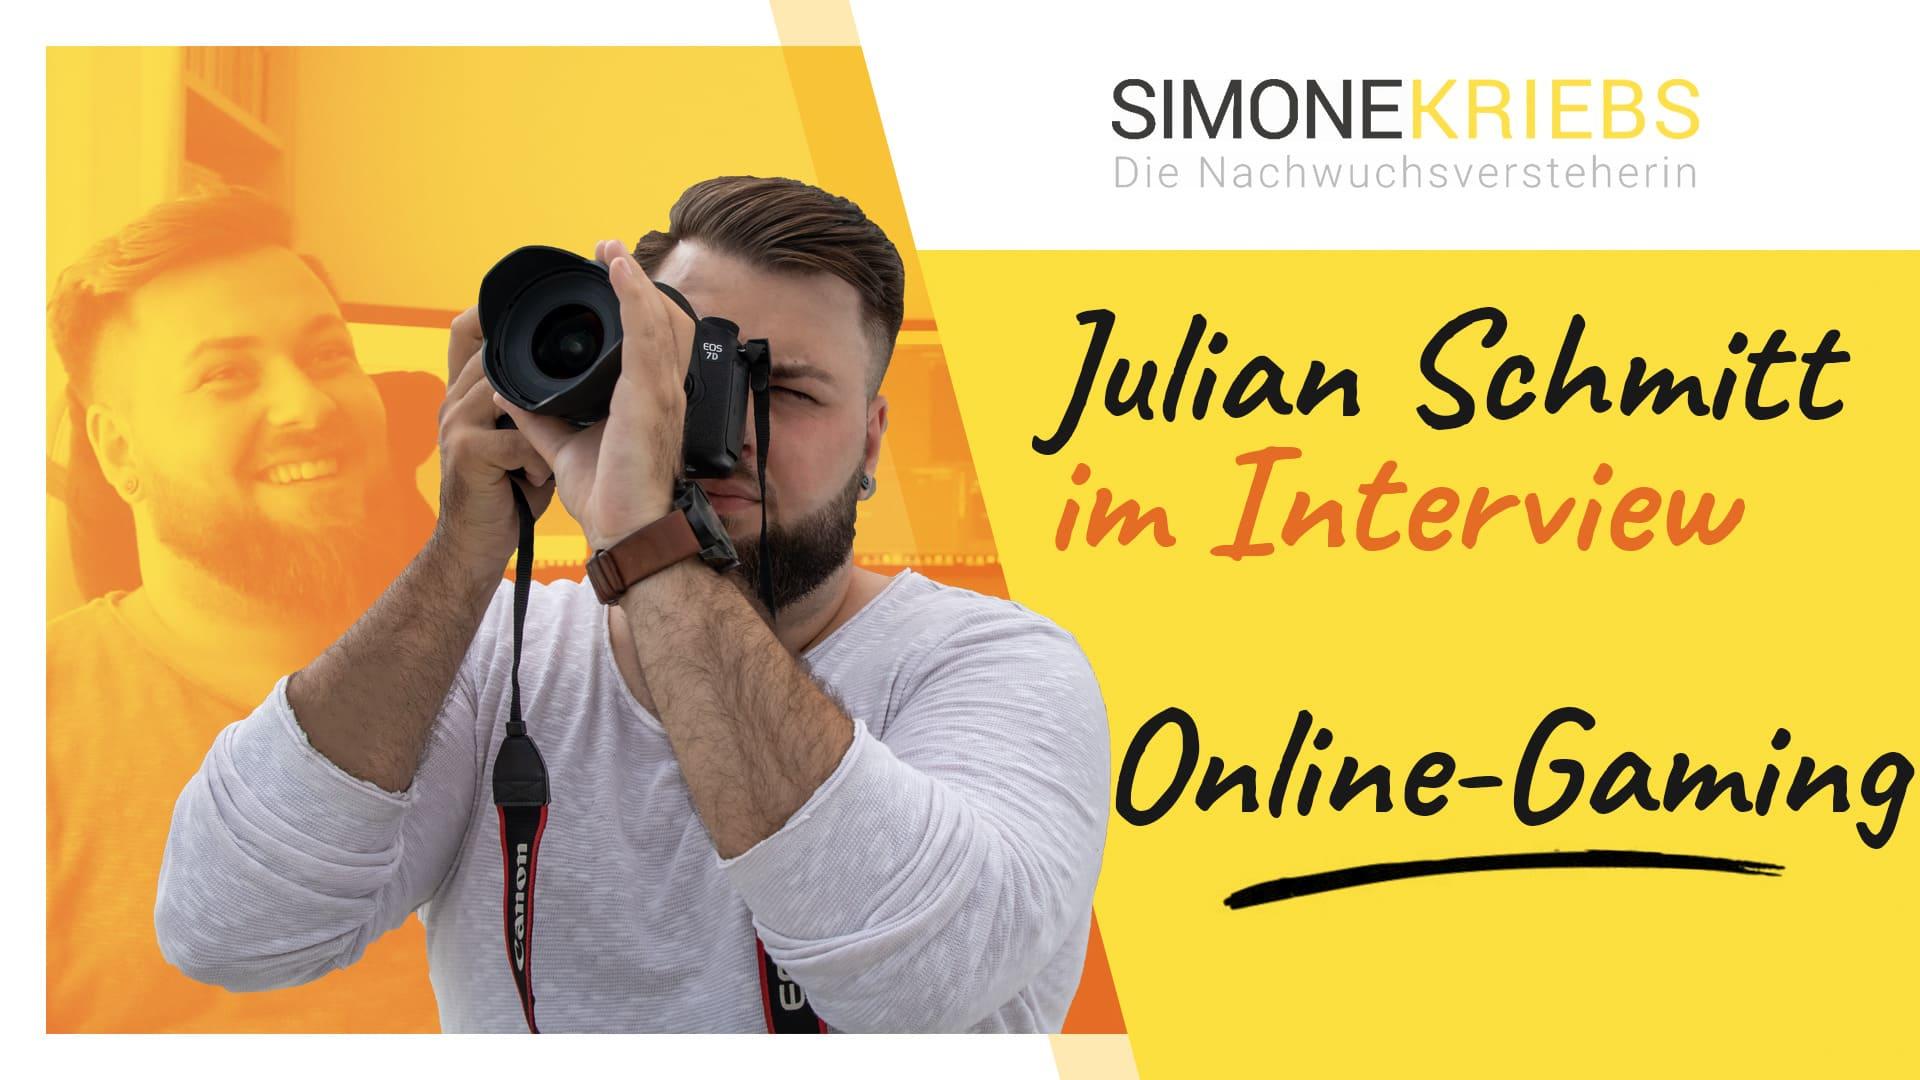 Julian Schmitt im Bildungsspirit-Interview: Online-Gaming als Vollzeitjob